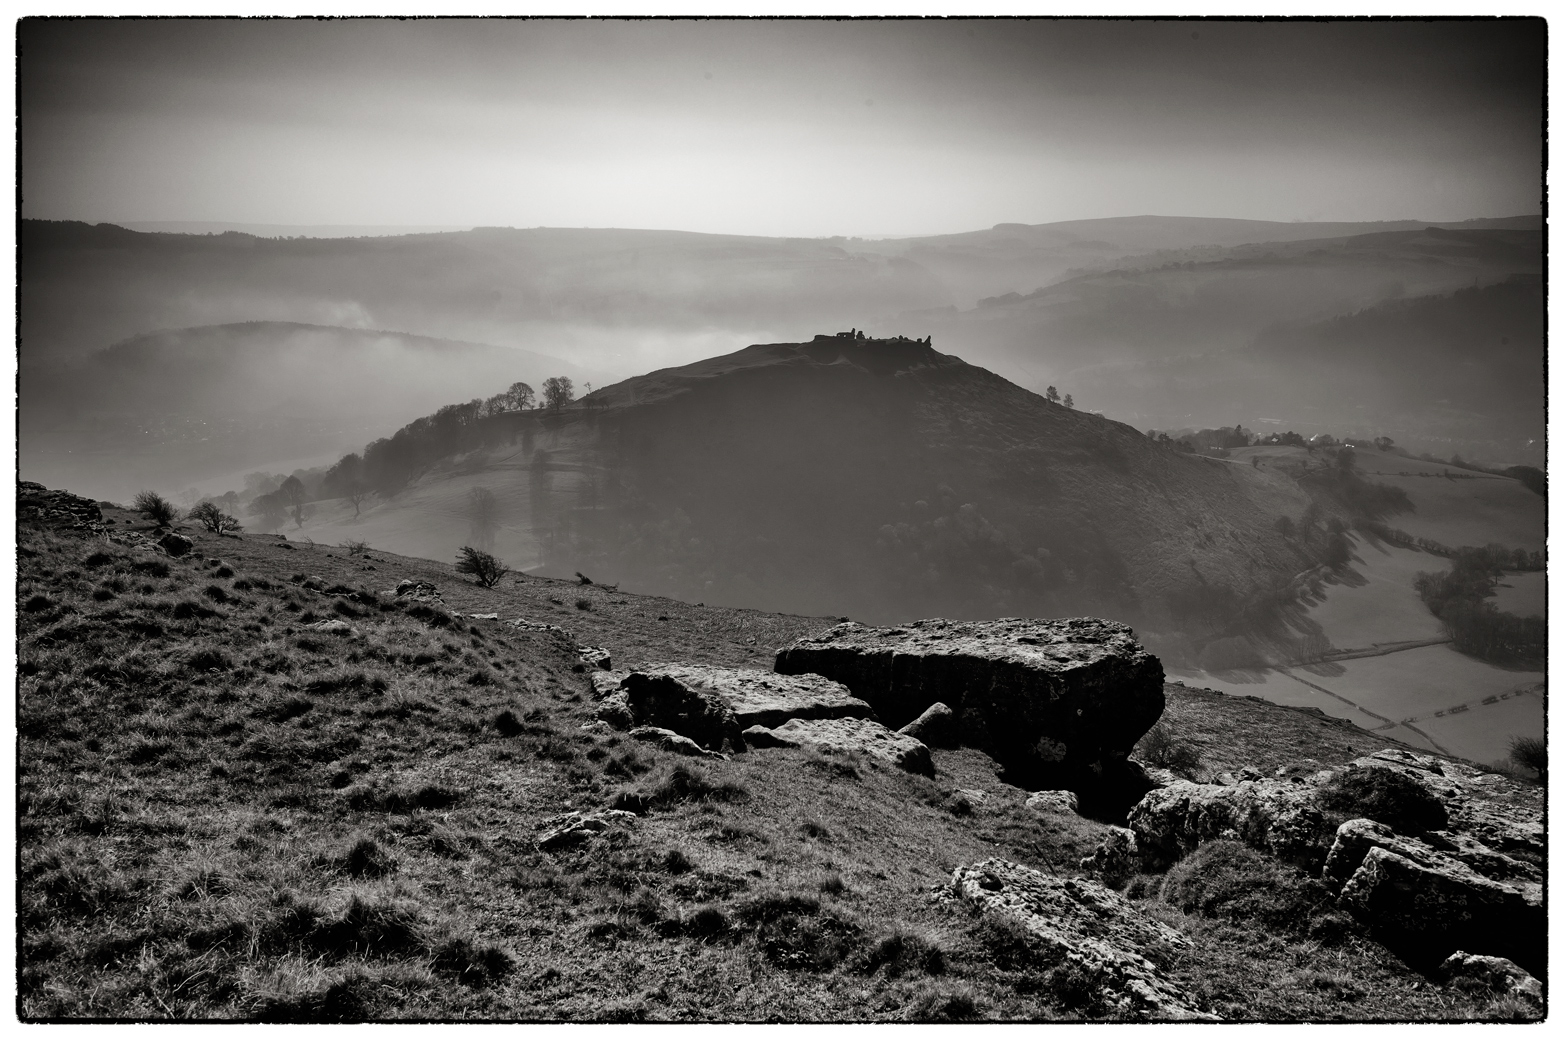 The Castle of Dinas Bran above Llangollen in the mist.